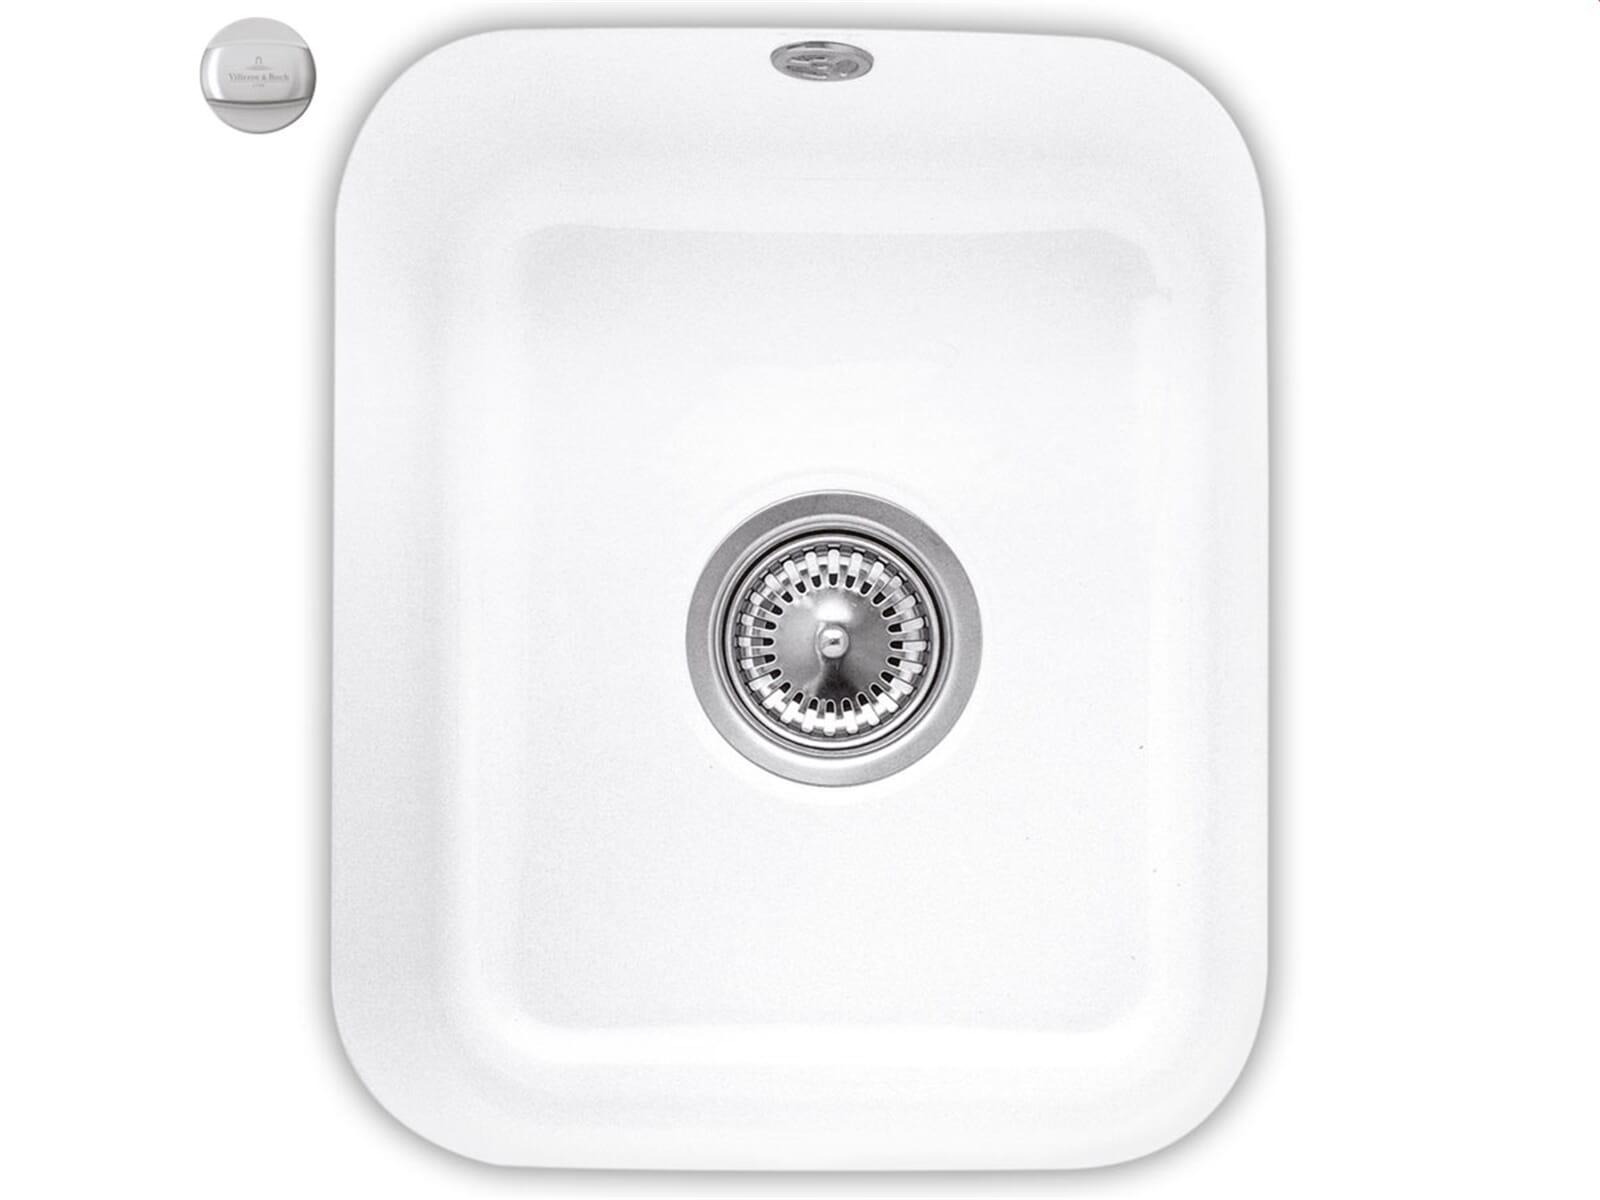 Villeroy & Boch Cisterna 45 Snow White - 6704 02 KG Keramikspüle Exzenterbetätigung